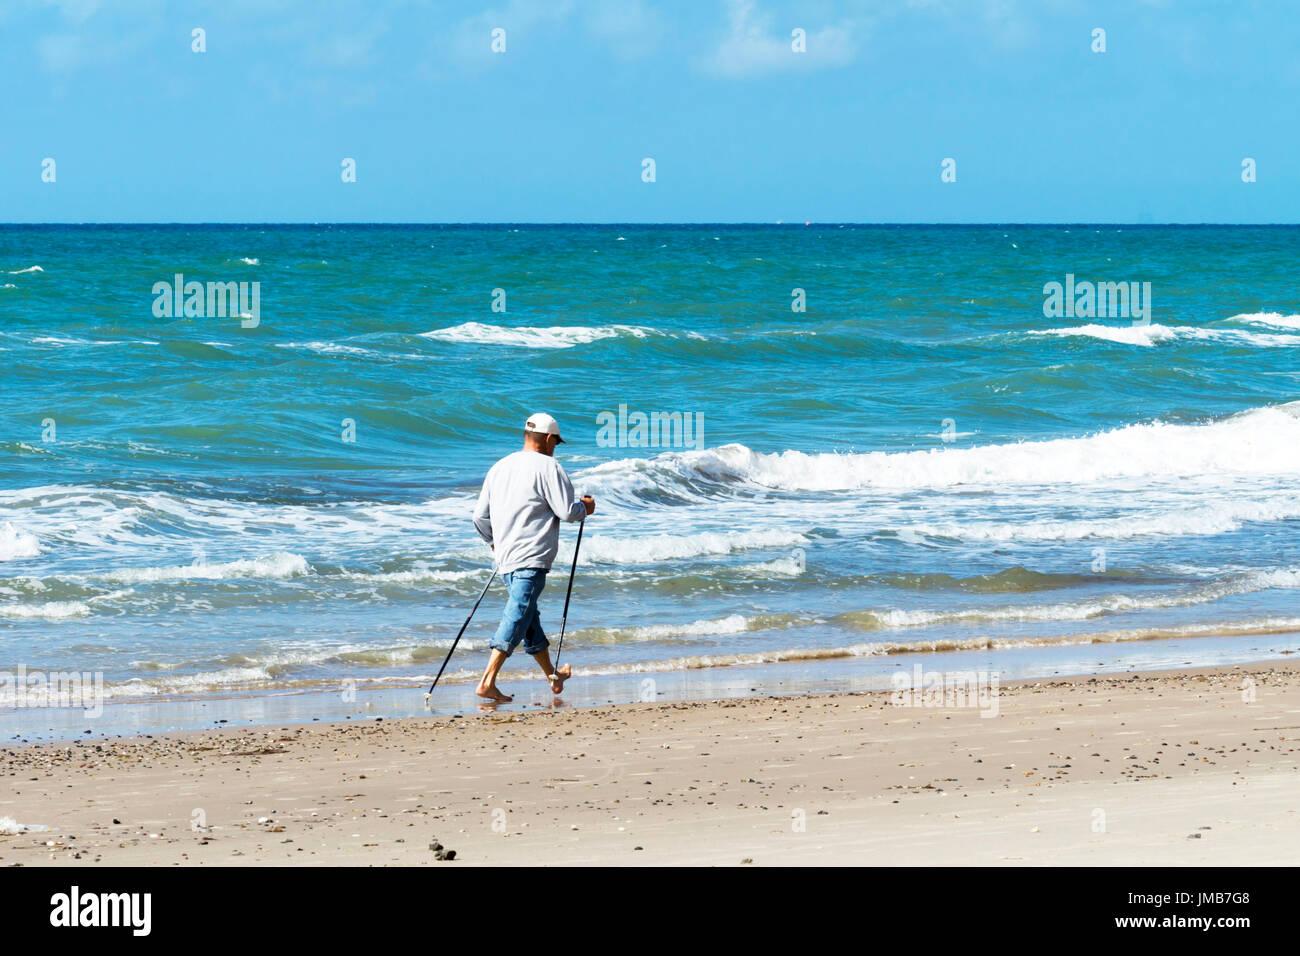 Nordic walking on the beach - Stock Image